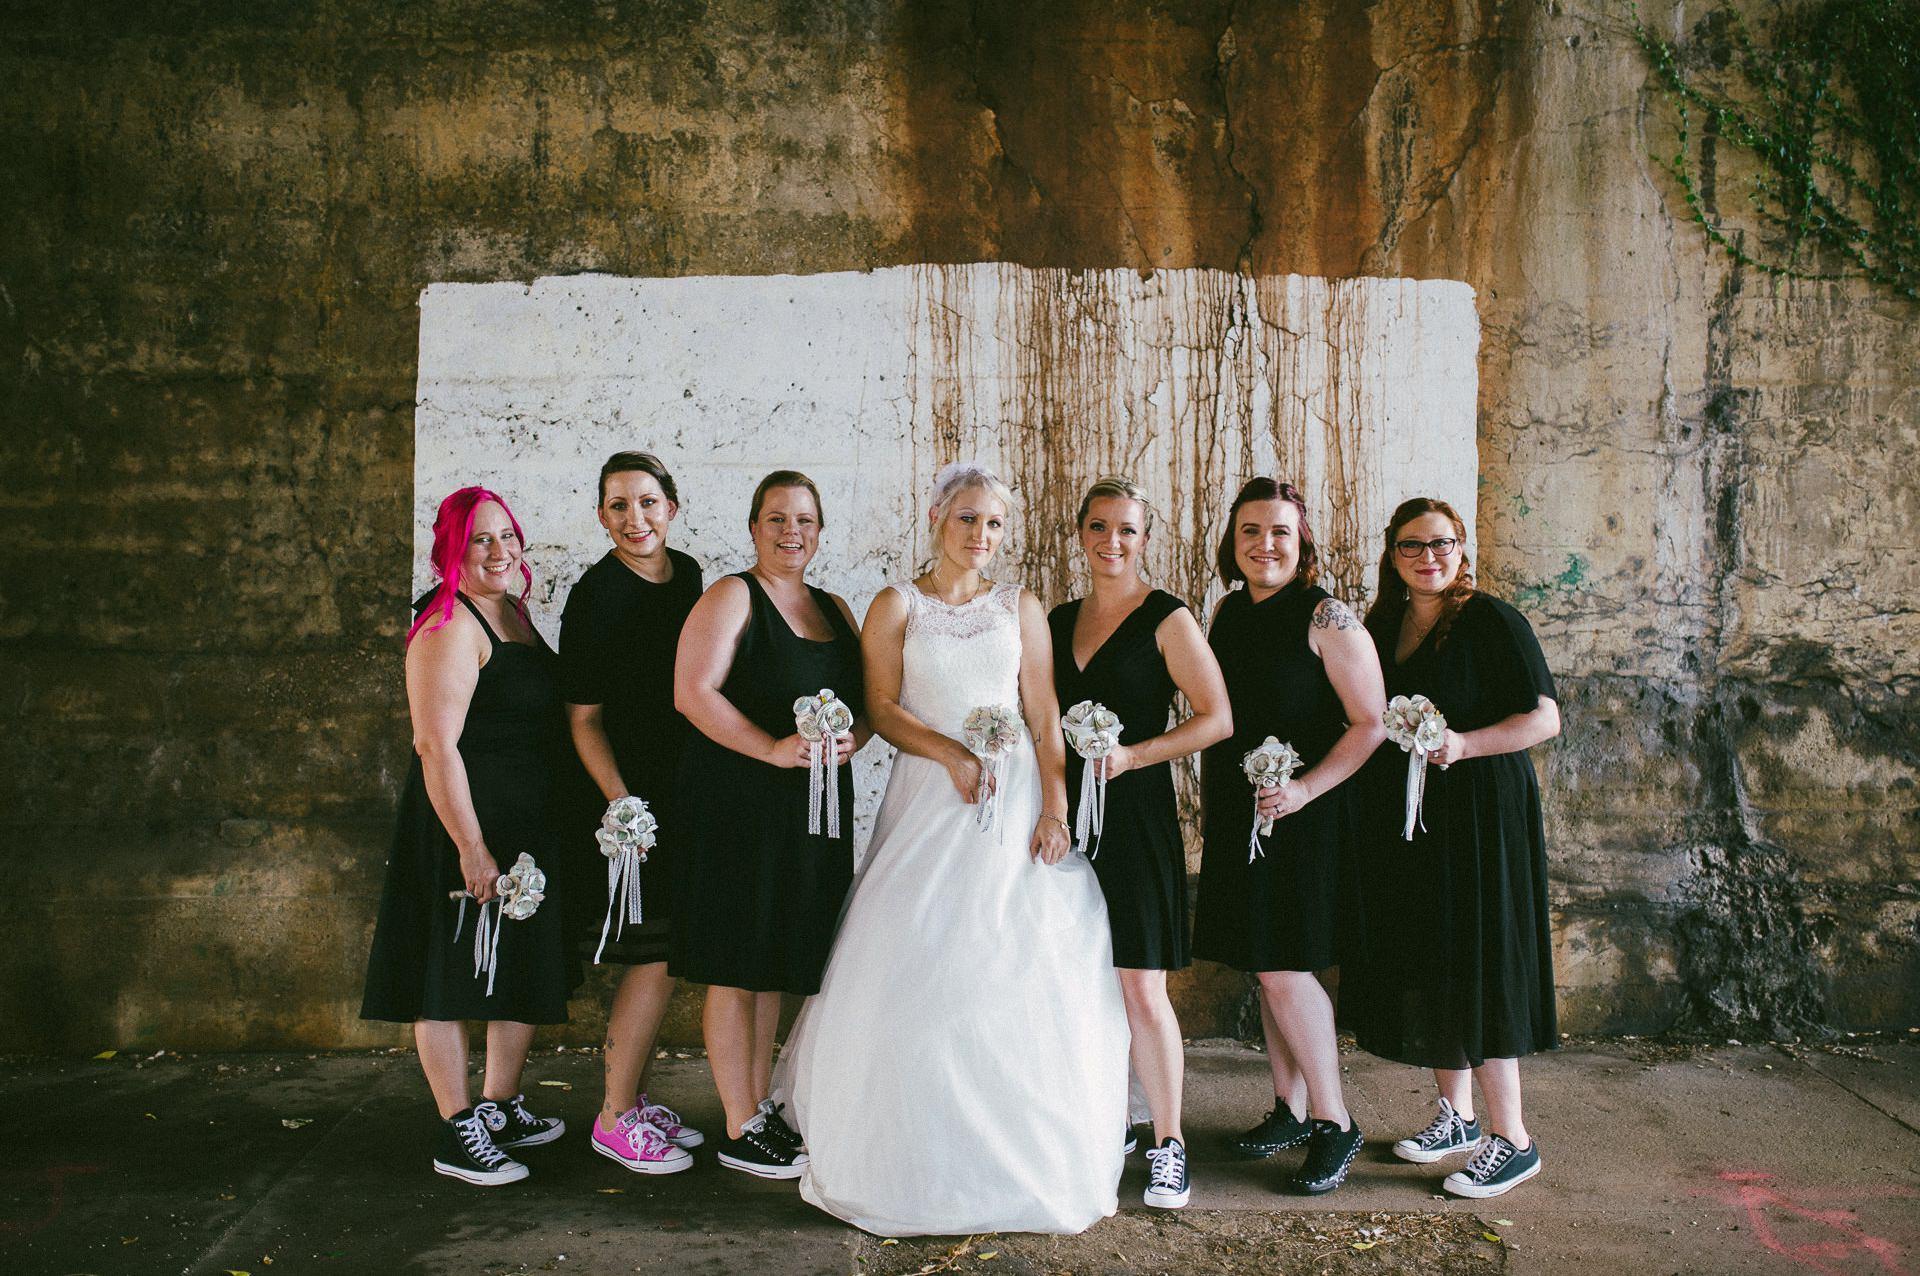 Goldhorn Brewery Wedding Photos in Cleveland 1 50.jpg